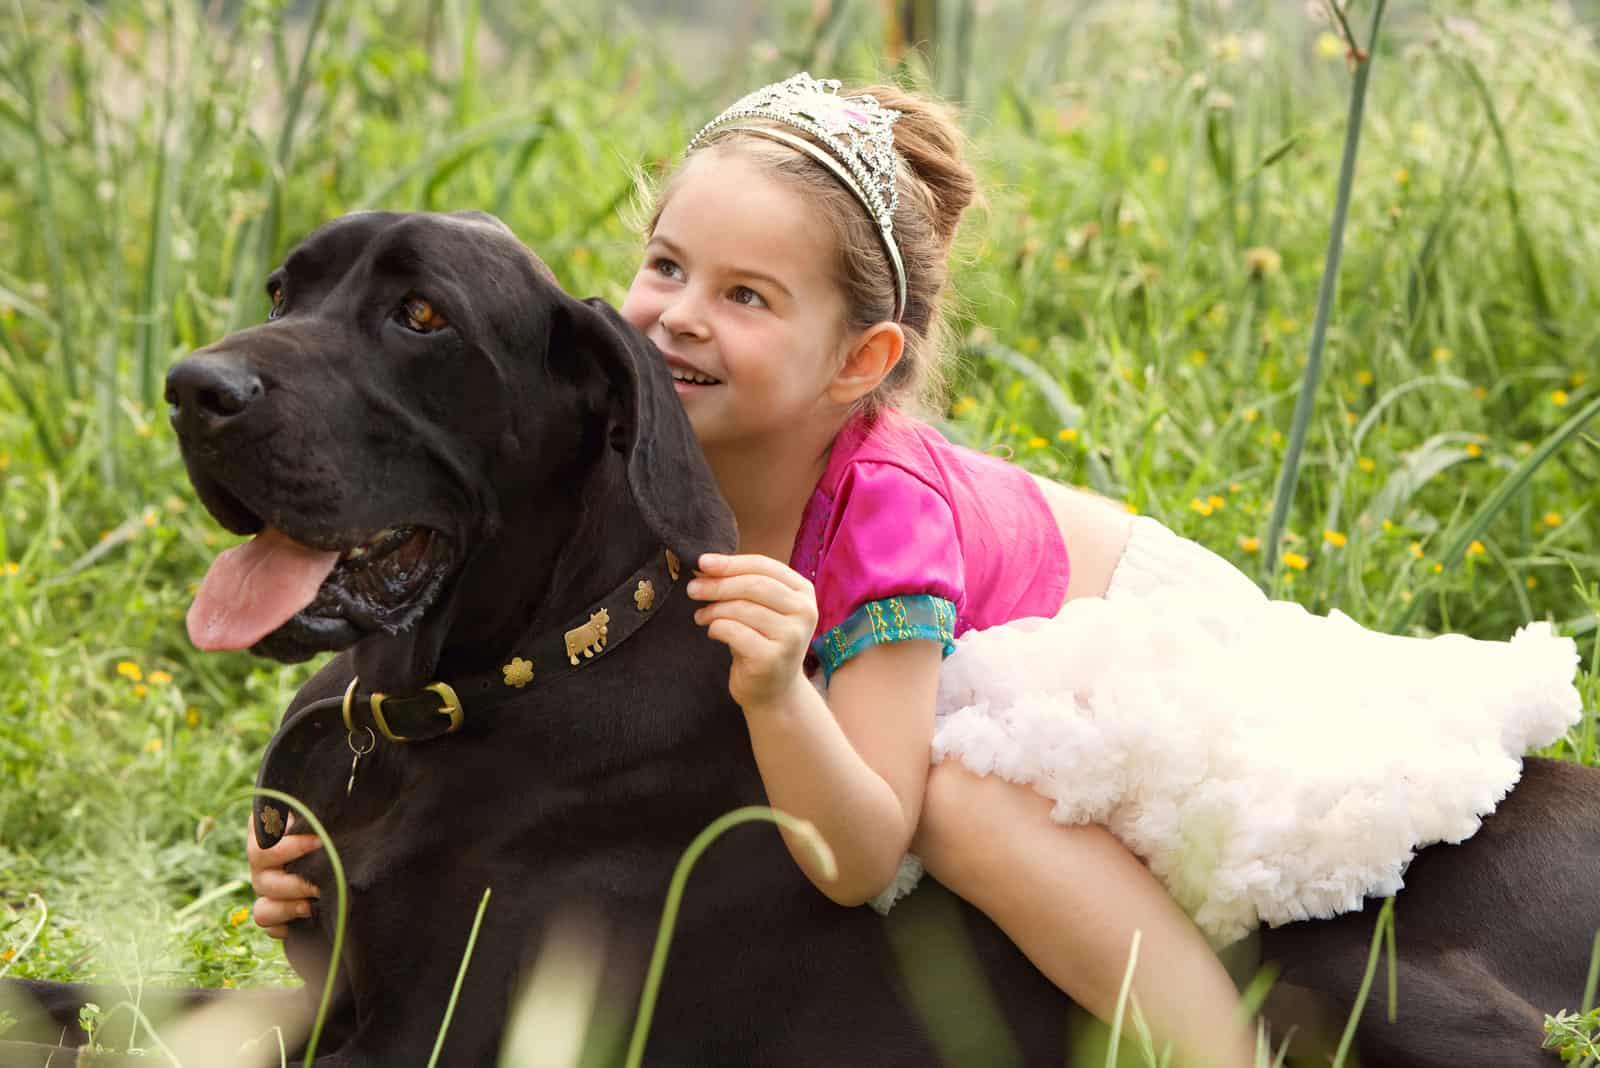 beautiful young girl wearing a fancy dress, sitting on her dog pet back